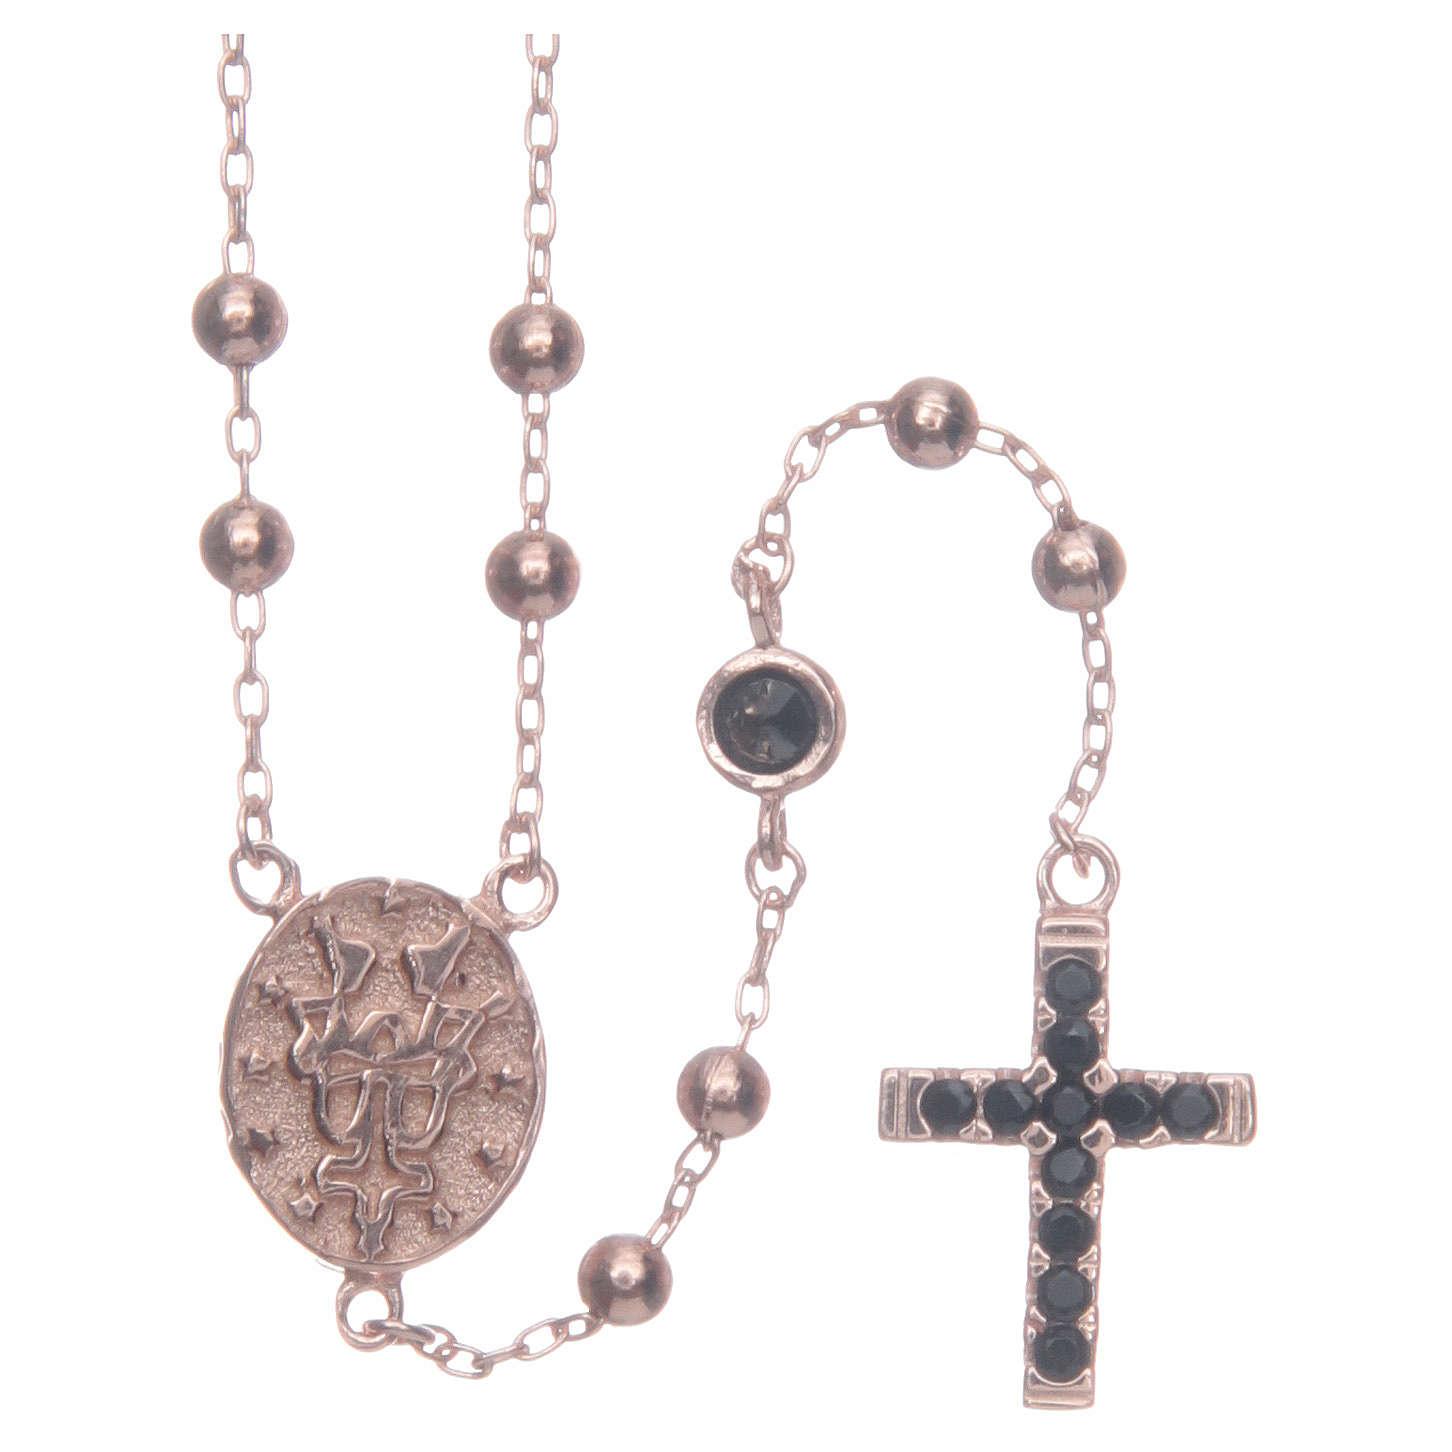 Rosario classico Santa Rita rosé zirconi neri argento 925 4